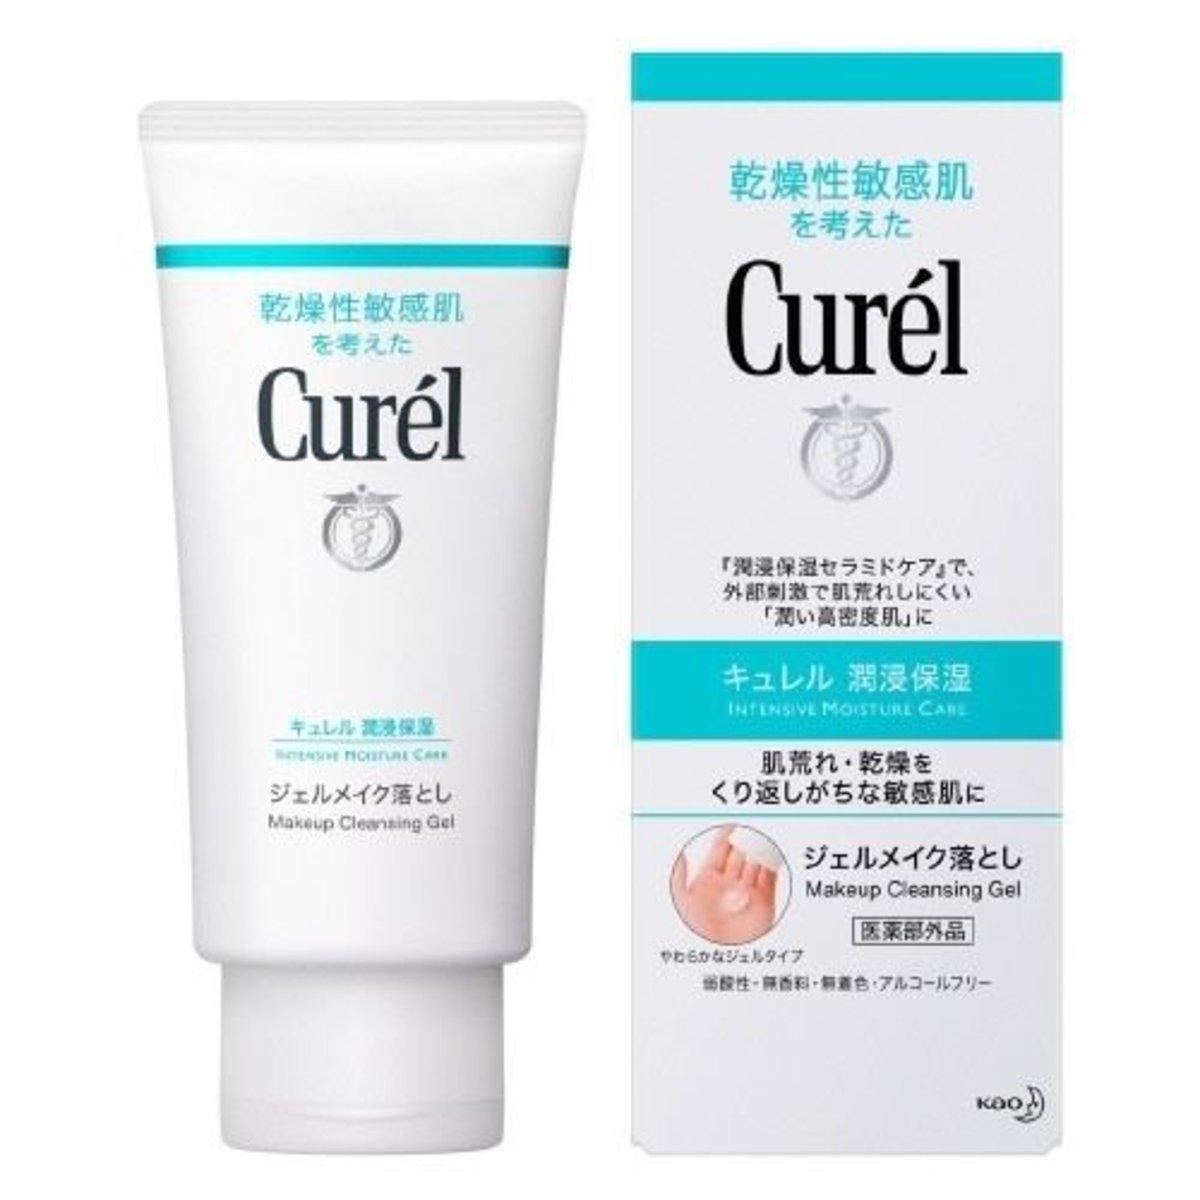 Makeup Cleansing Gel 130g [For Dry & Sensitive Skin Type]